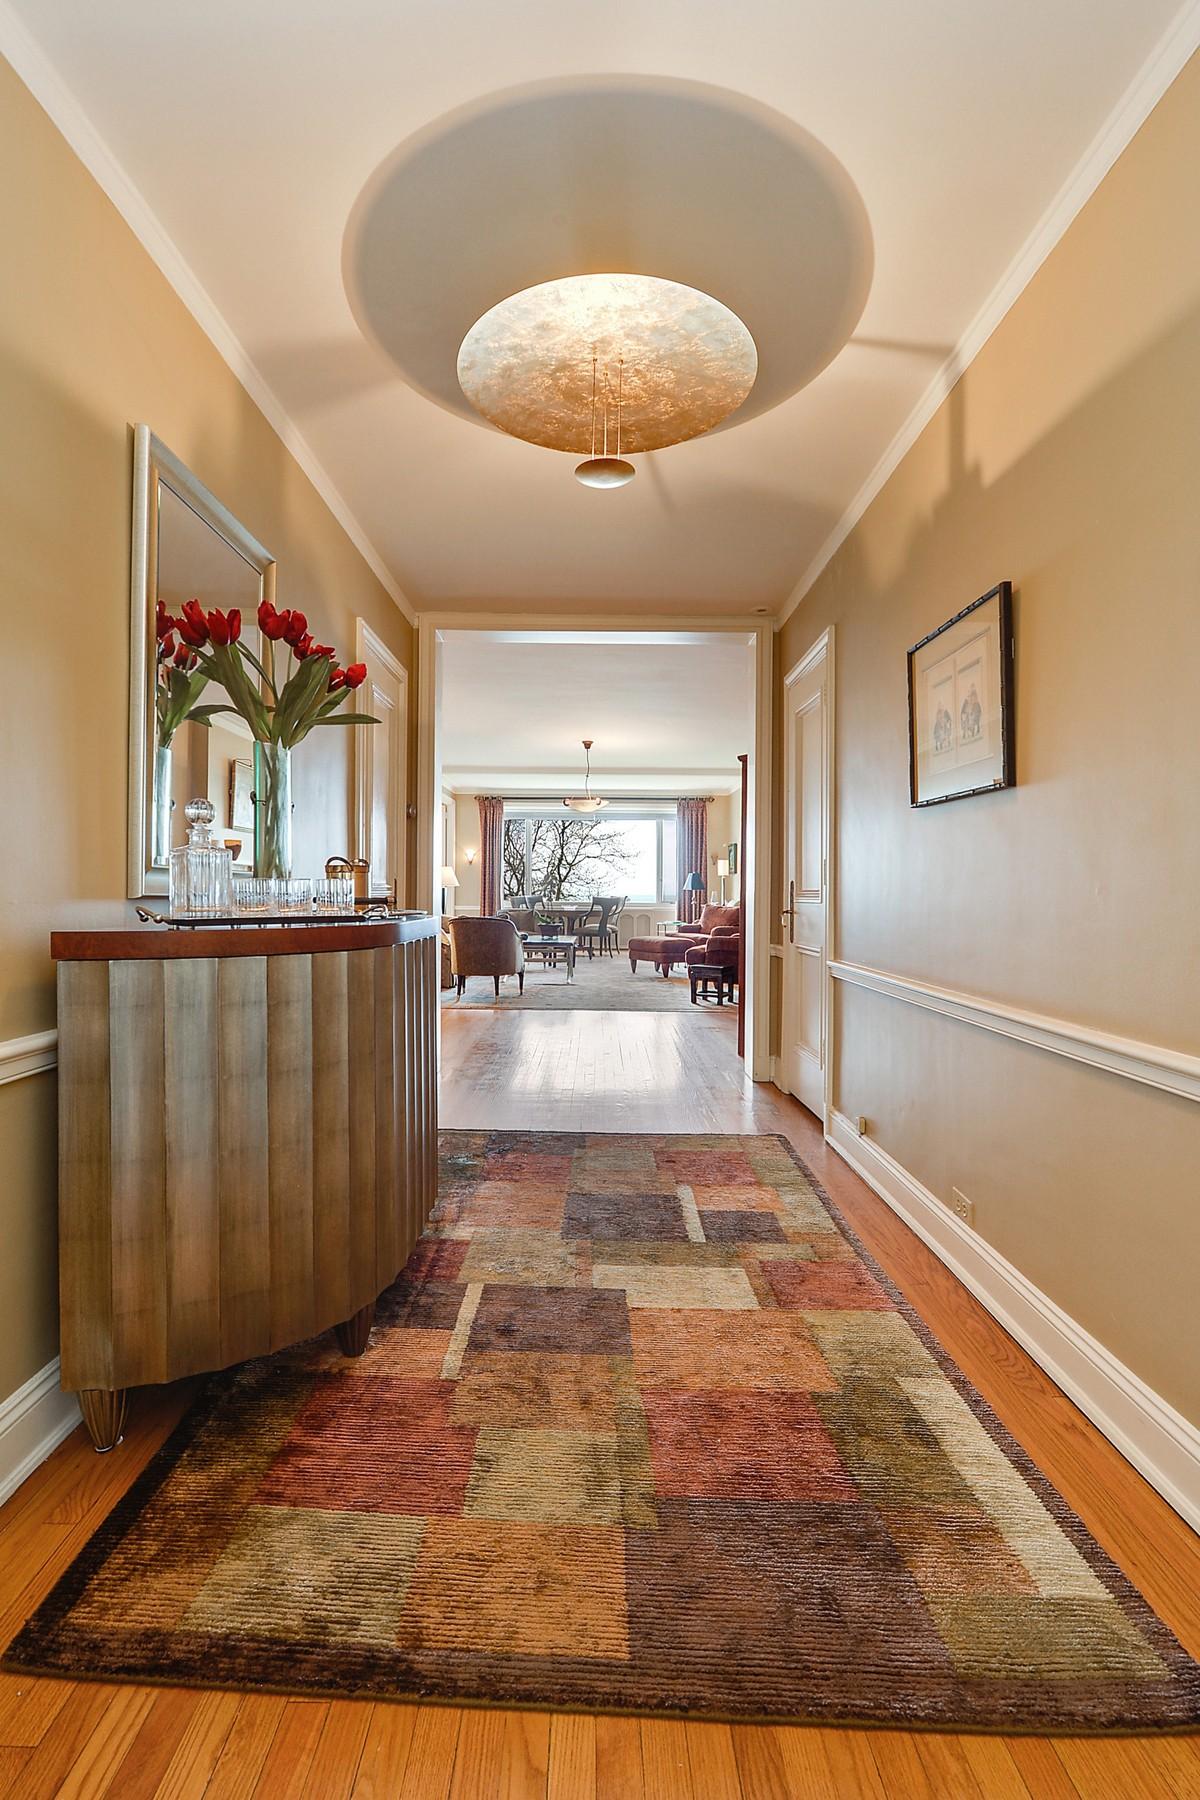 Tek Ailelik Ev için Satış at Historical Pied-A-Terre 179 E Lake Shore Drive Unit 502 Near North, Chicago, Illinois, 60611 Amerika Birleşik Devletleri